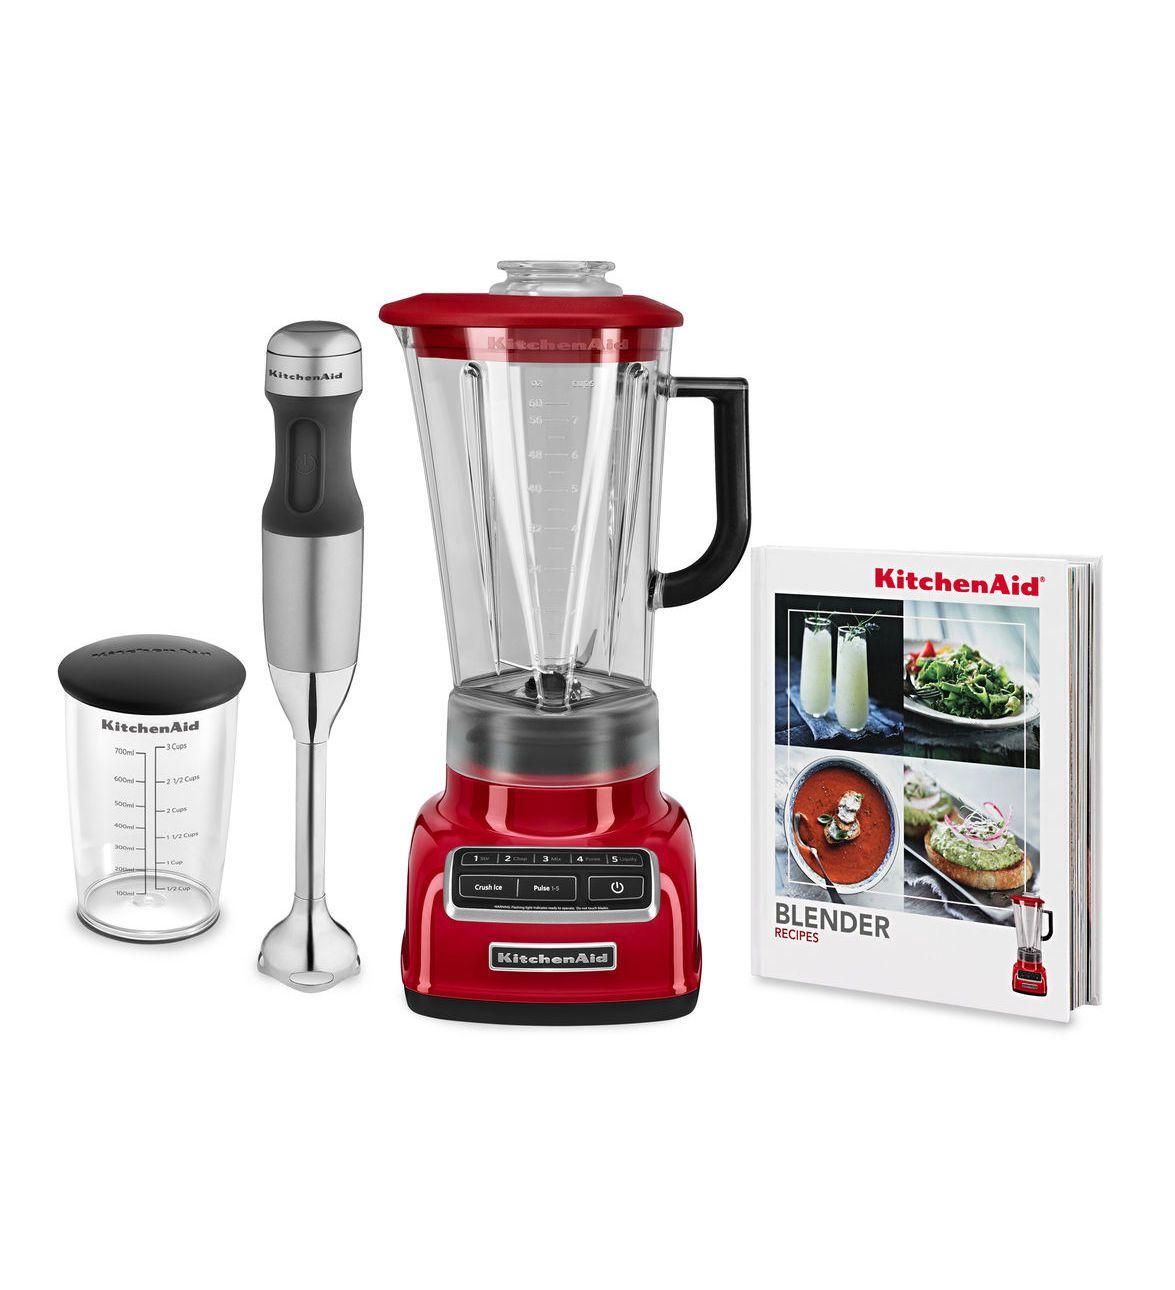 I so want this kitchenaid as seen on tv new kitchenaid